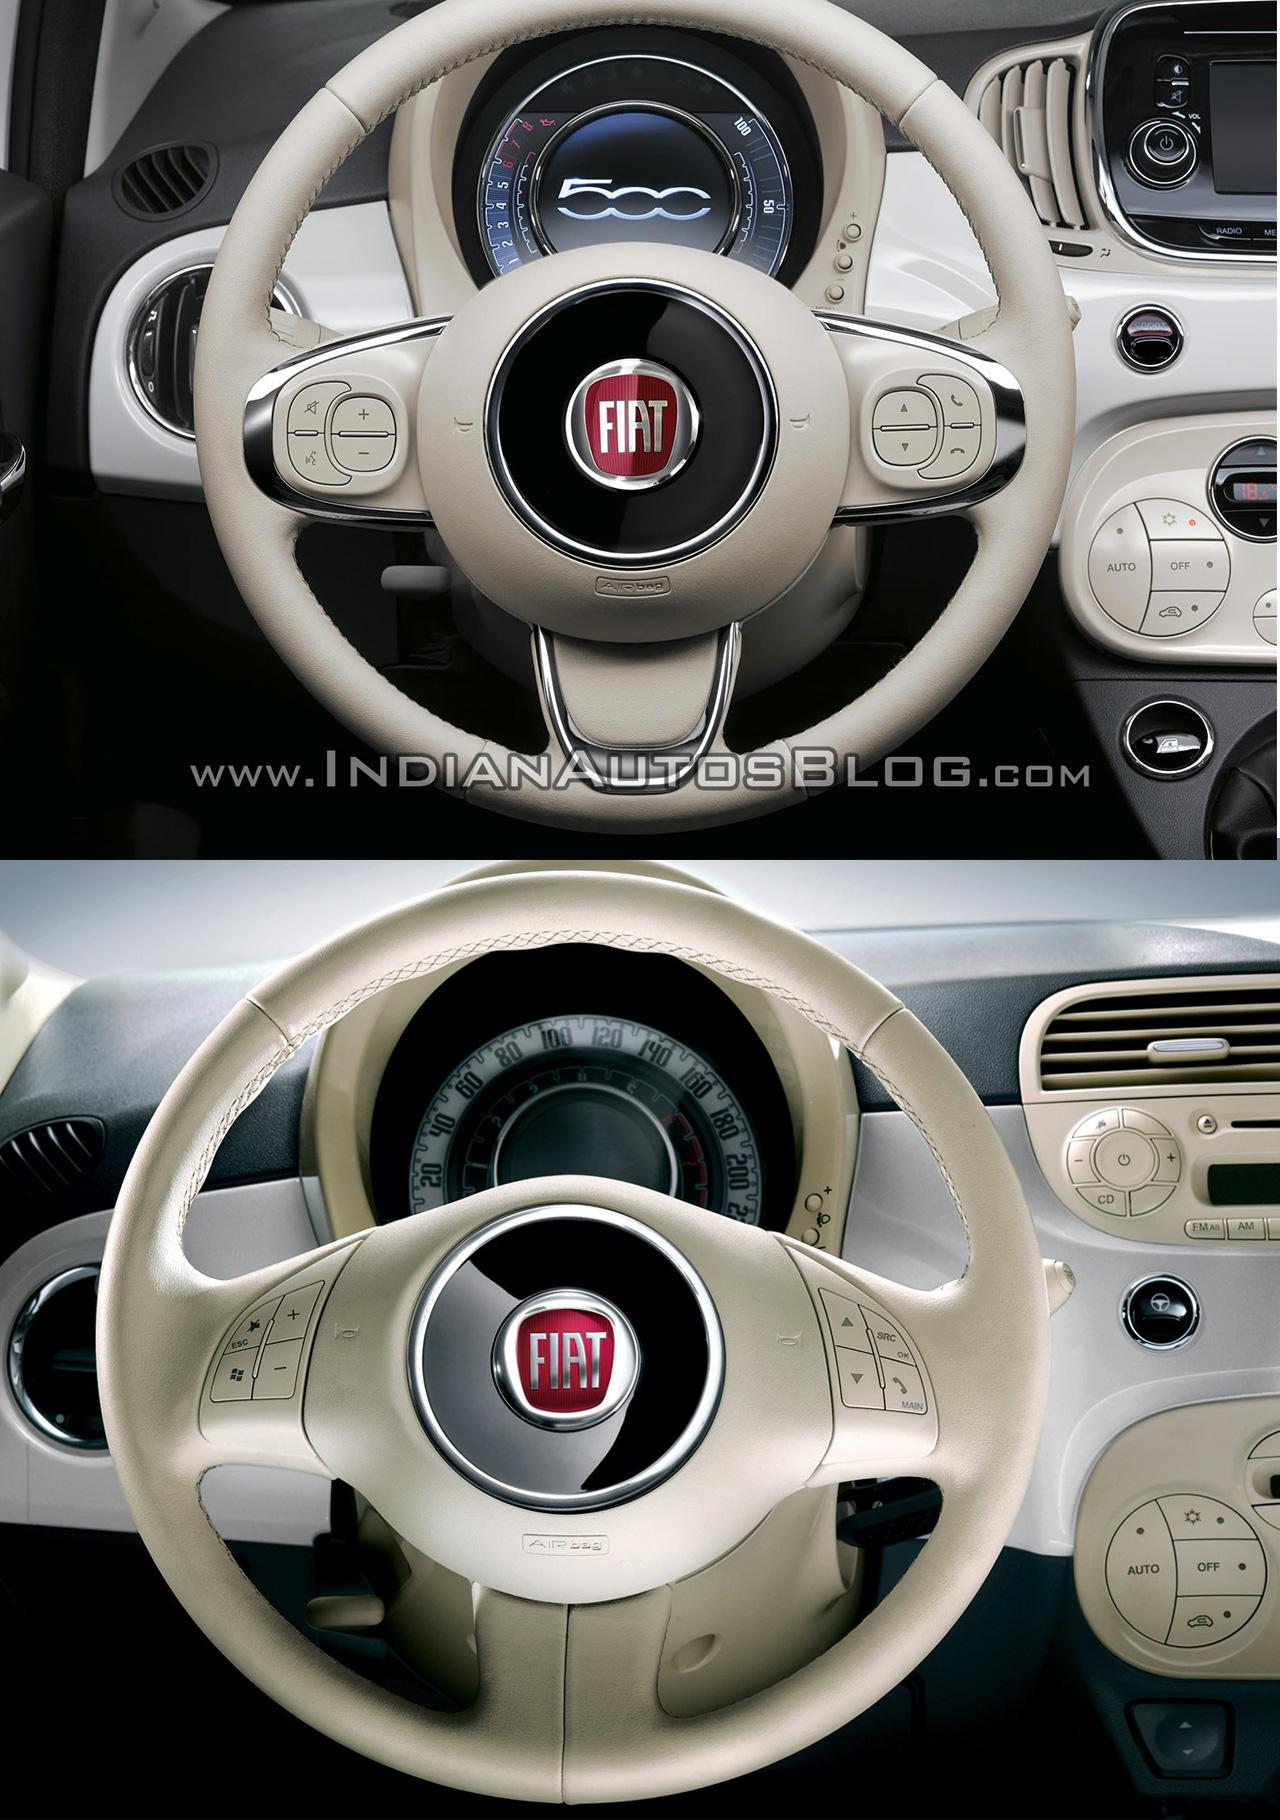 2016 Fiat 500 (facelift) vs 2007 Fiat 500 steering wheel Old vs New